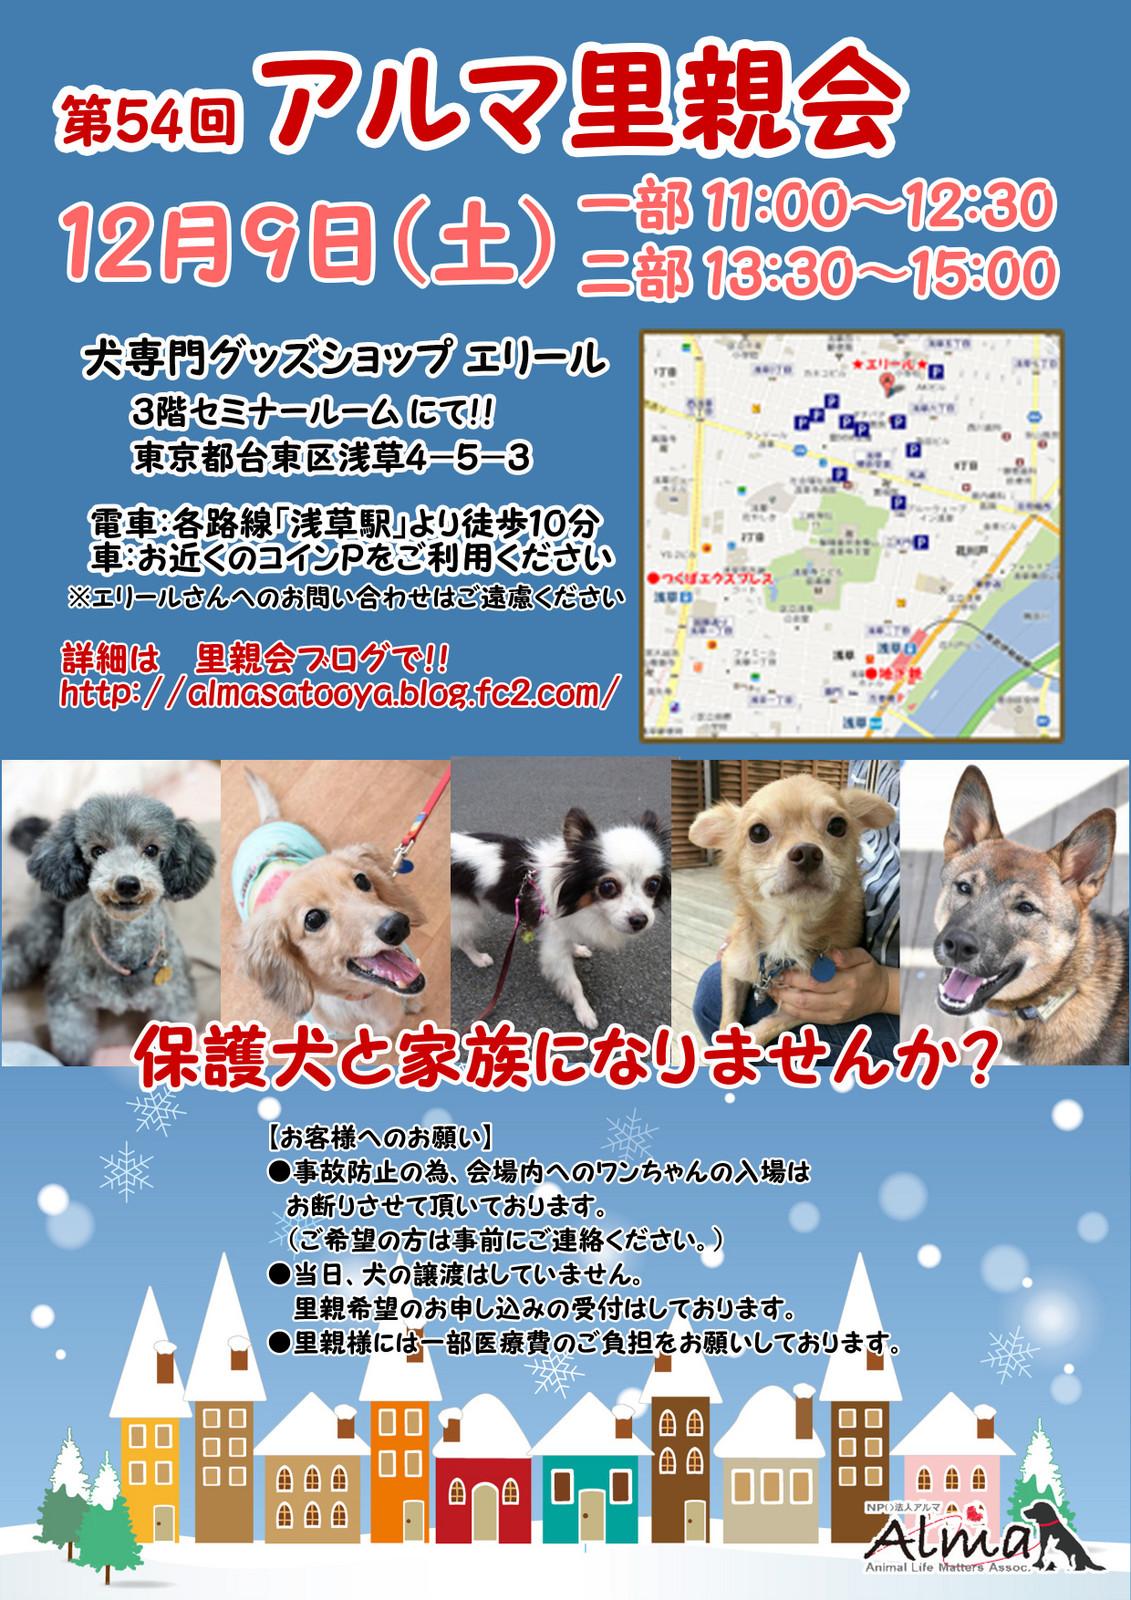 Poster_2017112313095441d_2